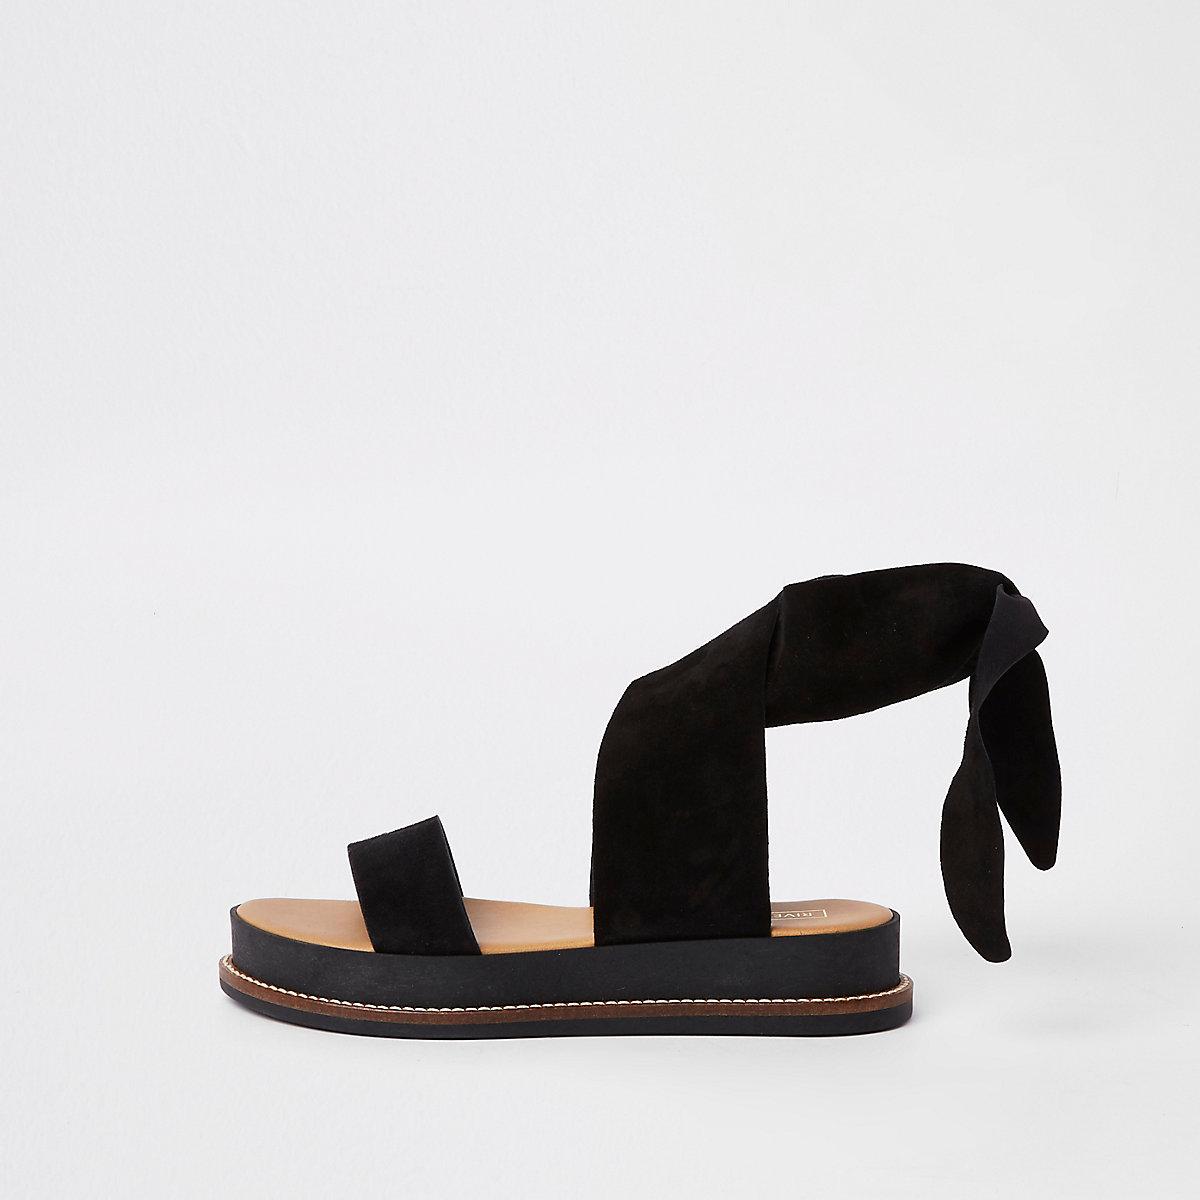 Black suede tie strap sandals